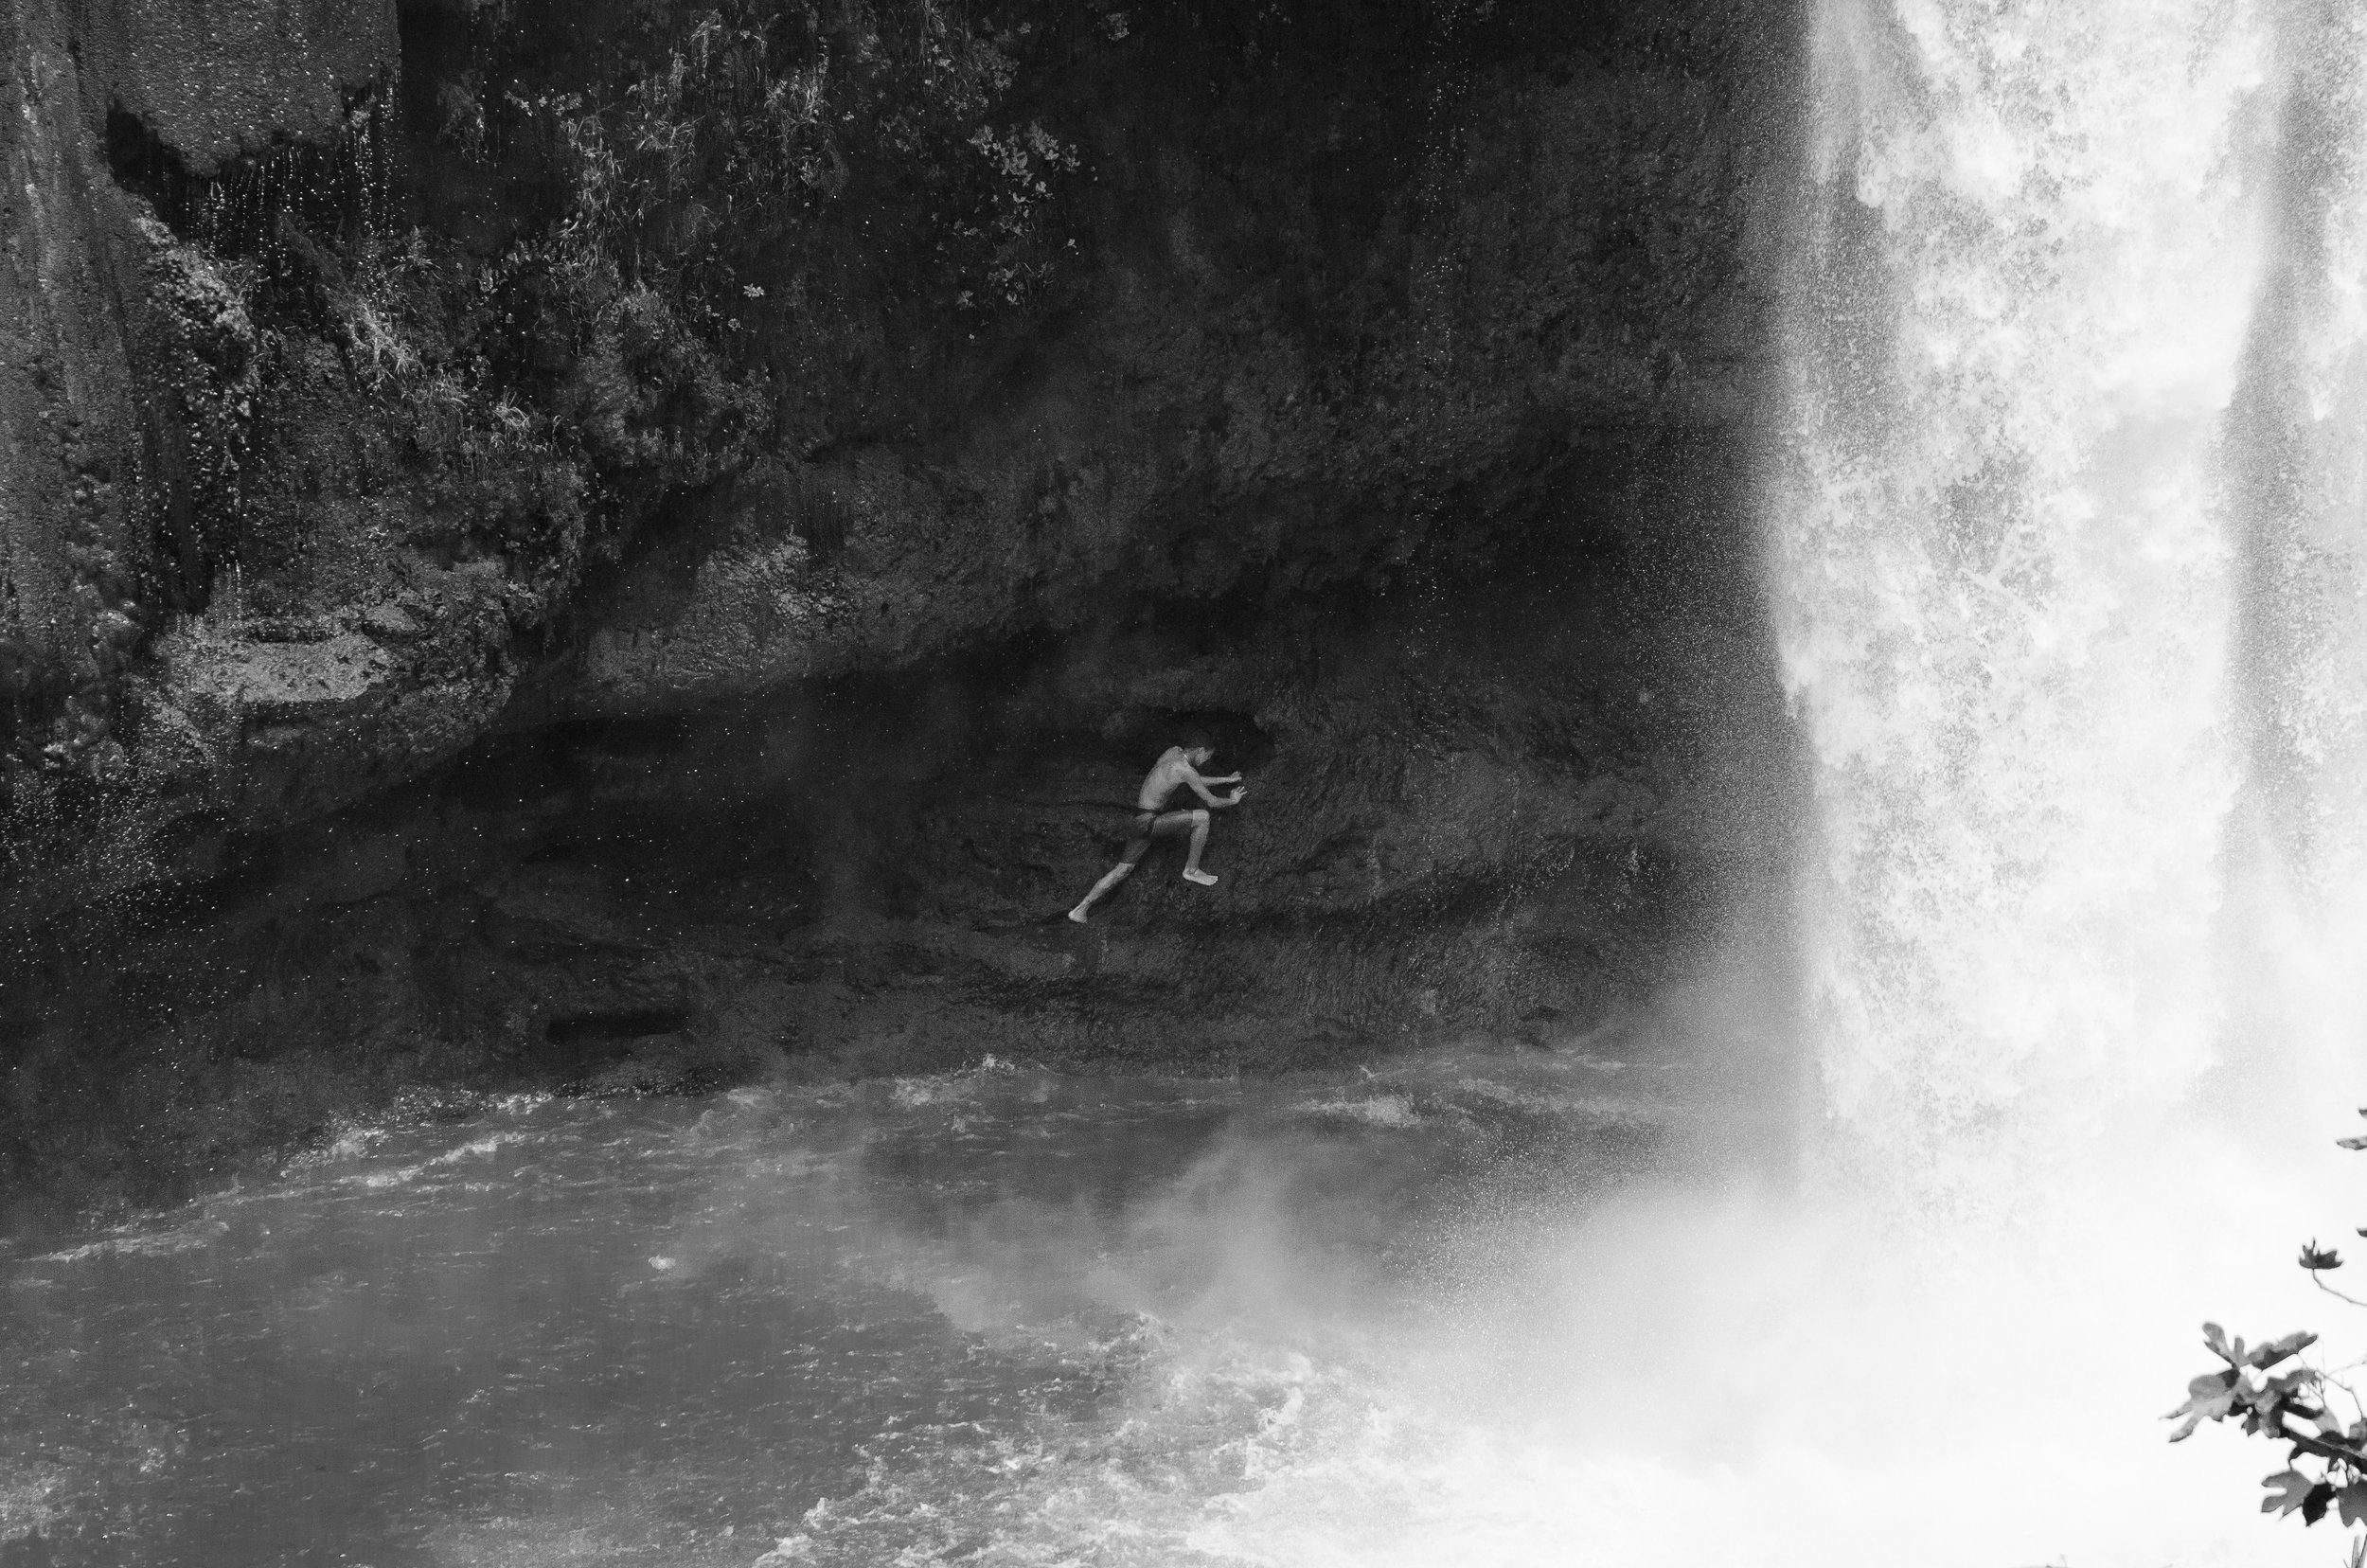 waterfalls_02.jpg